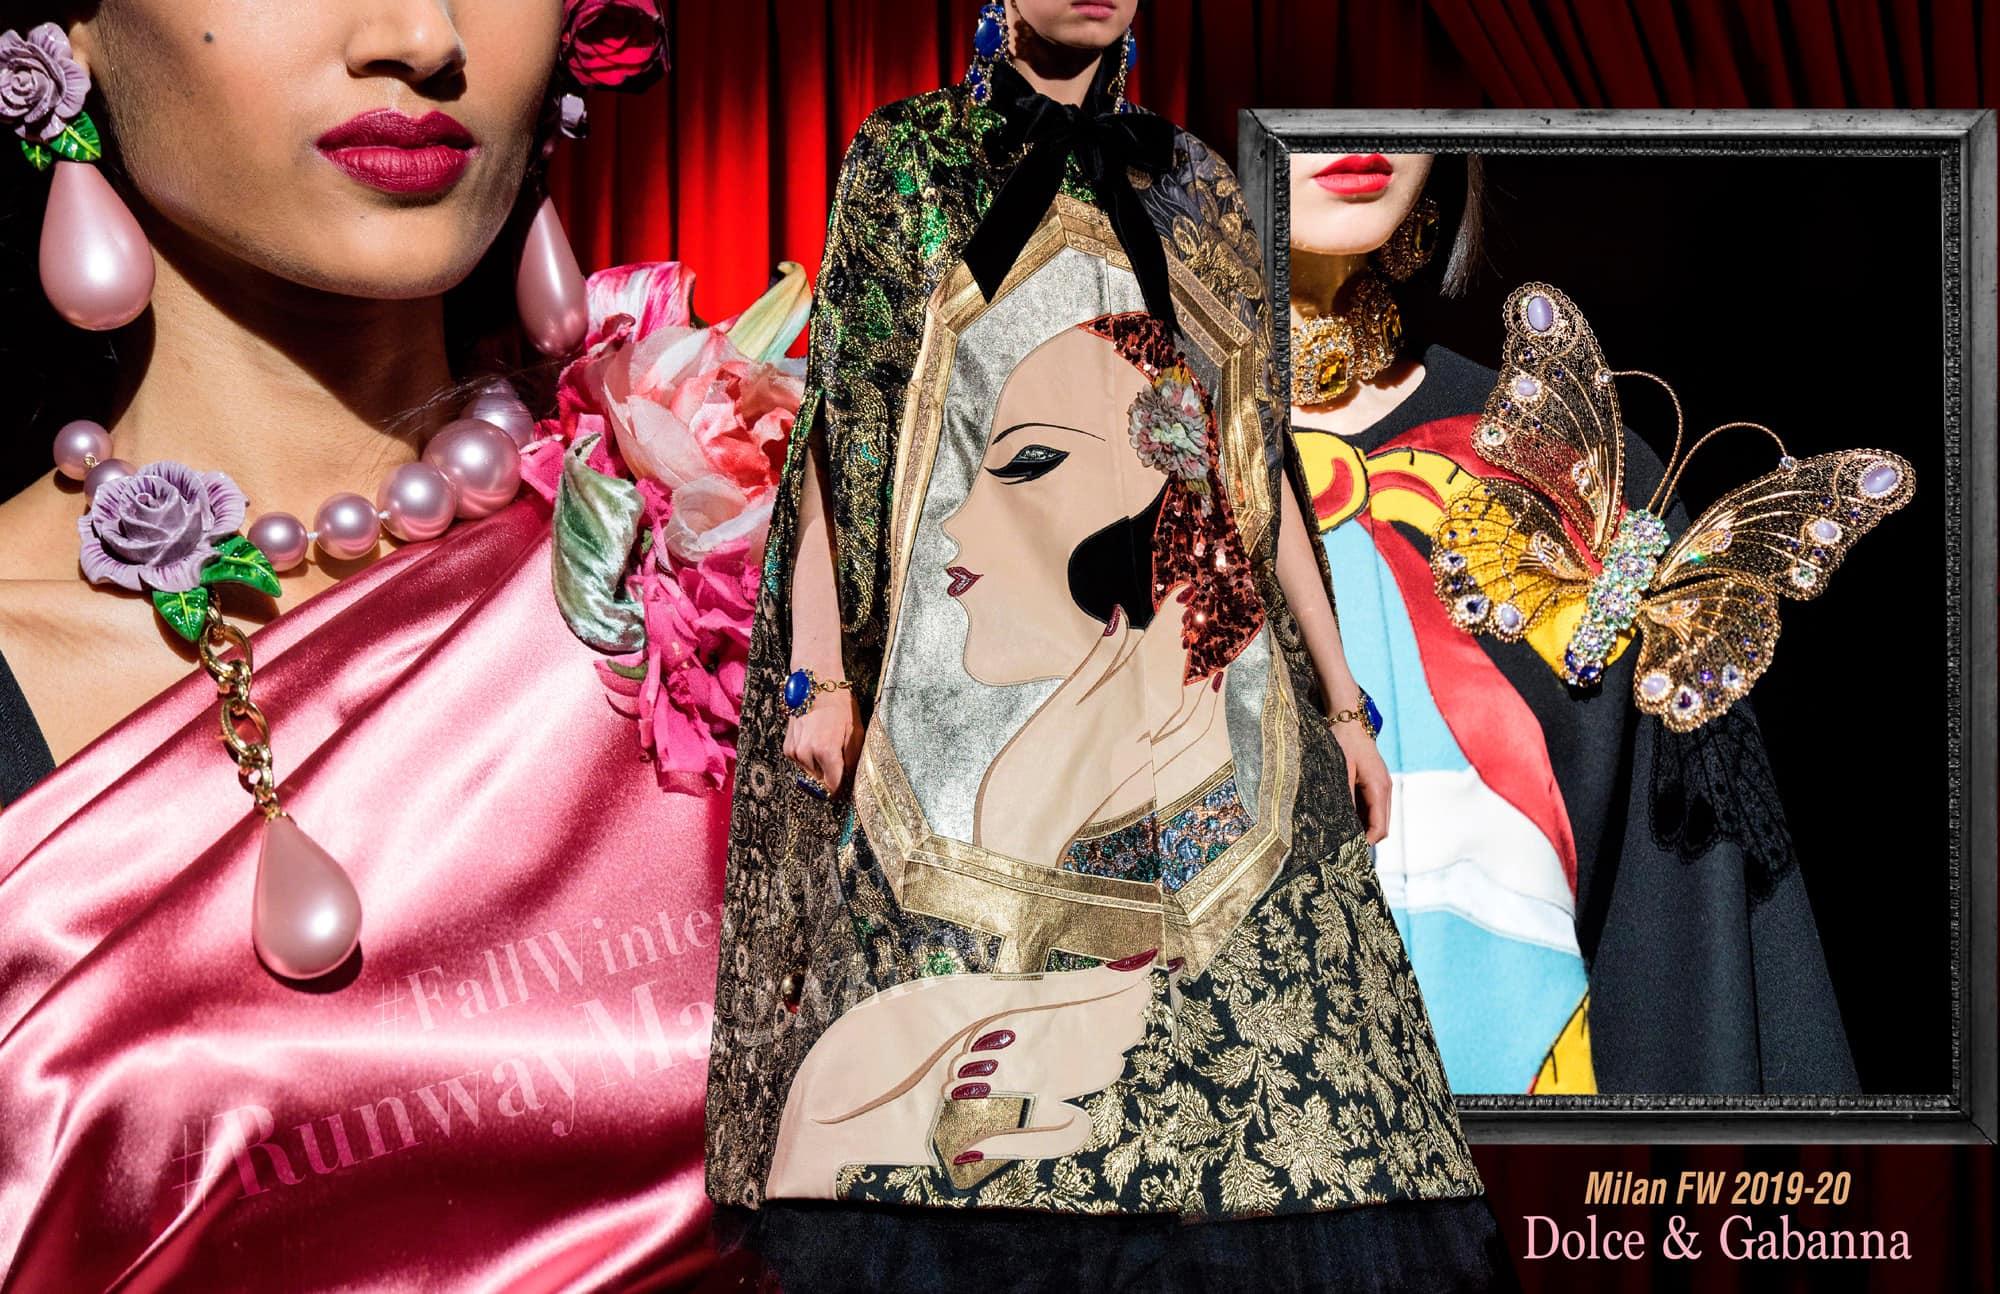 Dolce & Gabbana Fall Winter 2019-2020 Milan by RUNWAY MAGAZINE